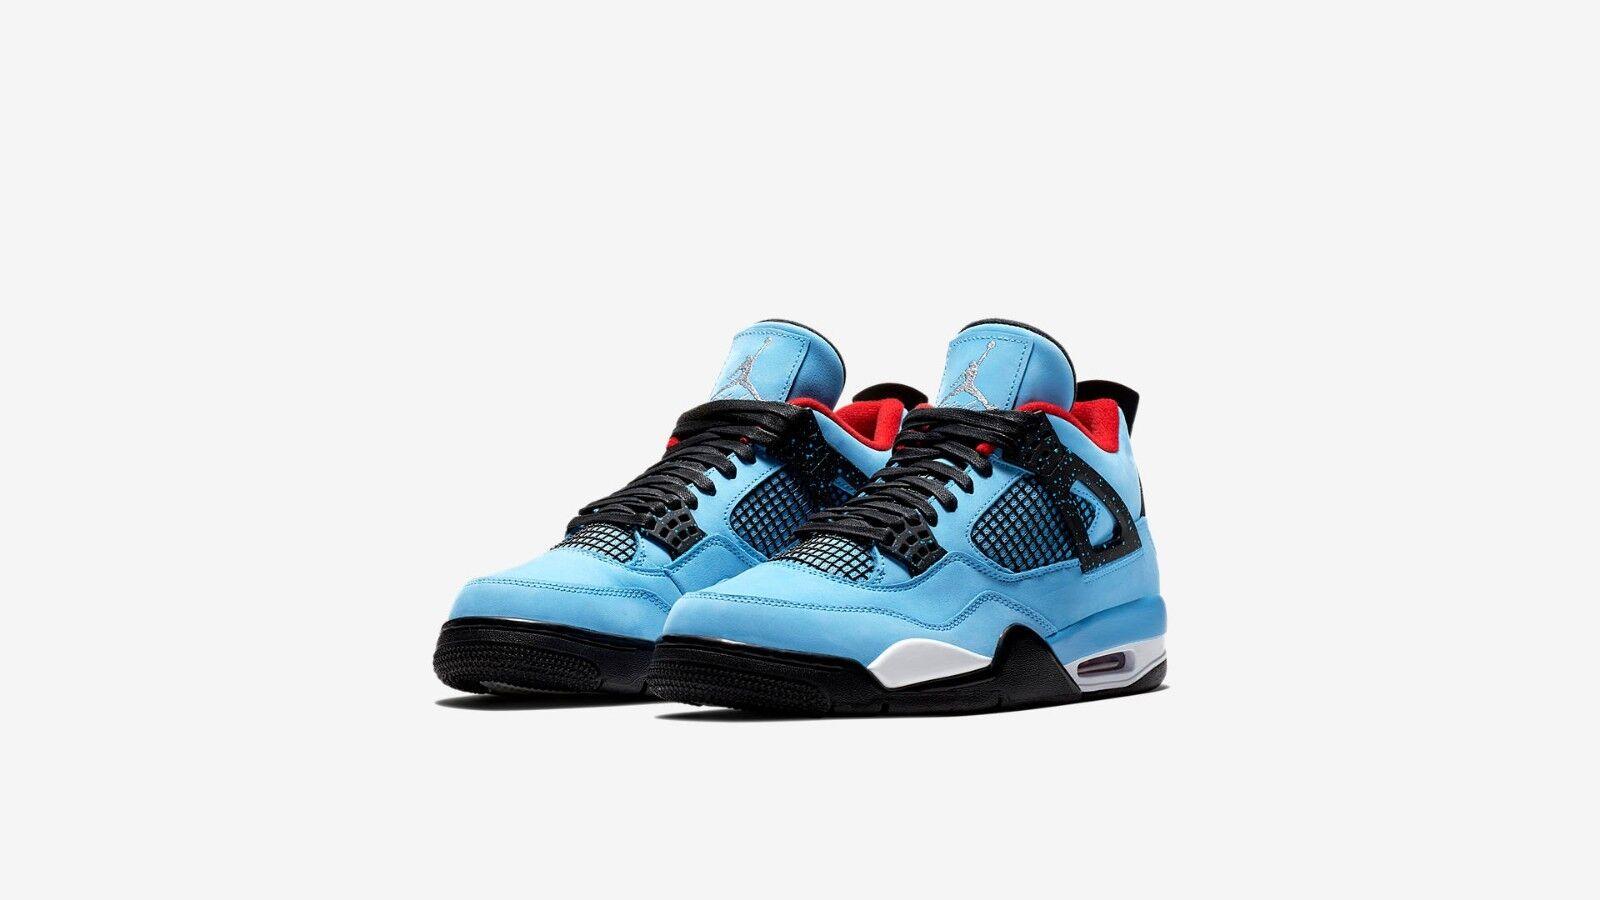 Nike Air Jordan 4 Retro Travis Scott  Cactus Jack  Size 15 [Force 1 Off White]